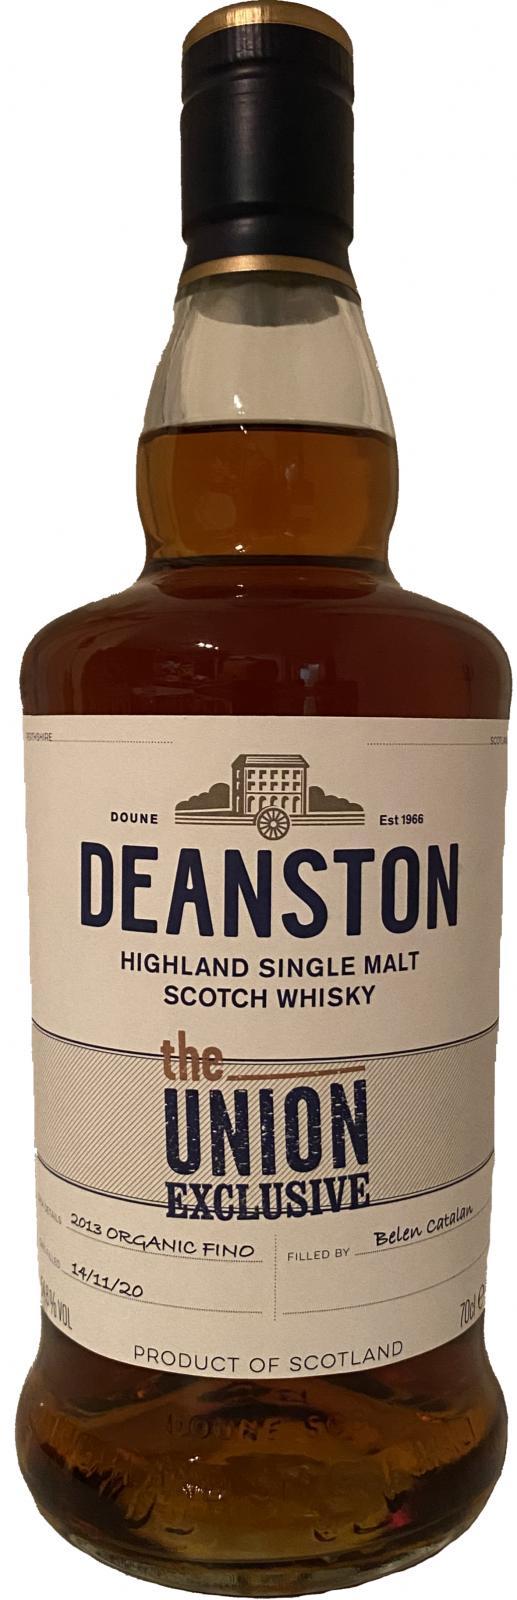 Deanston 2013